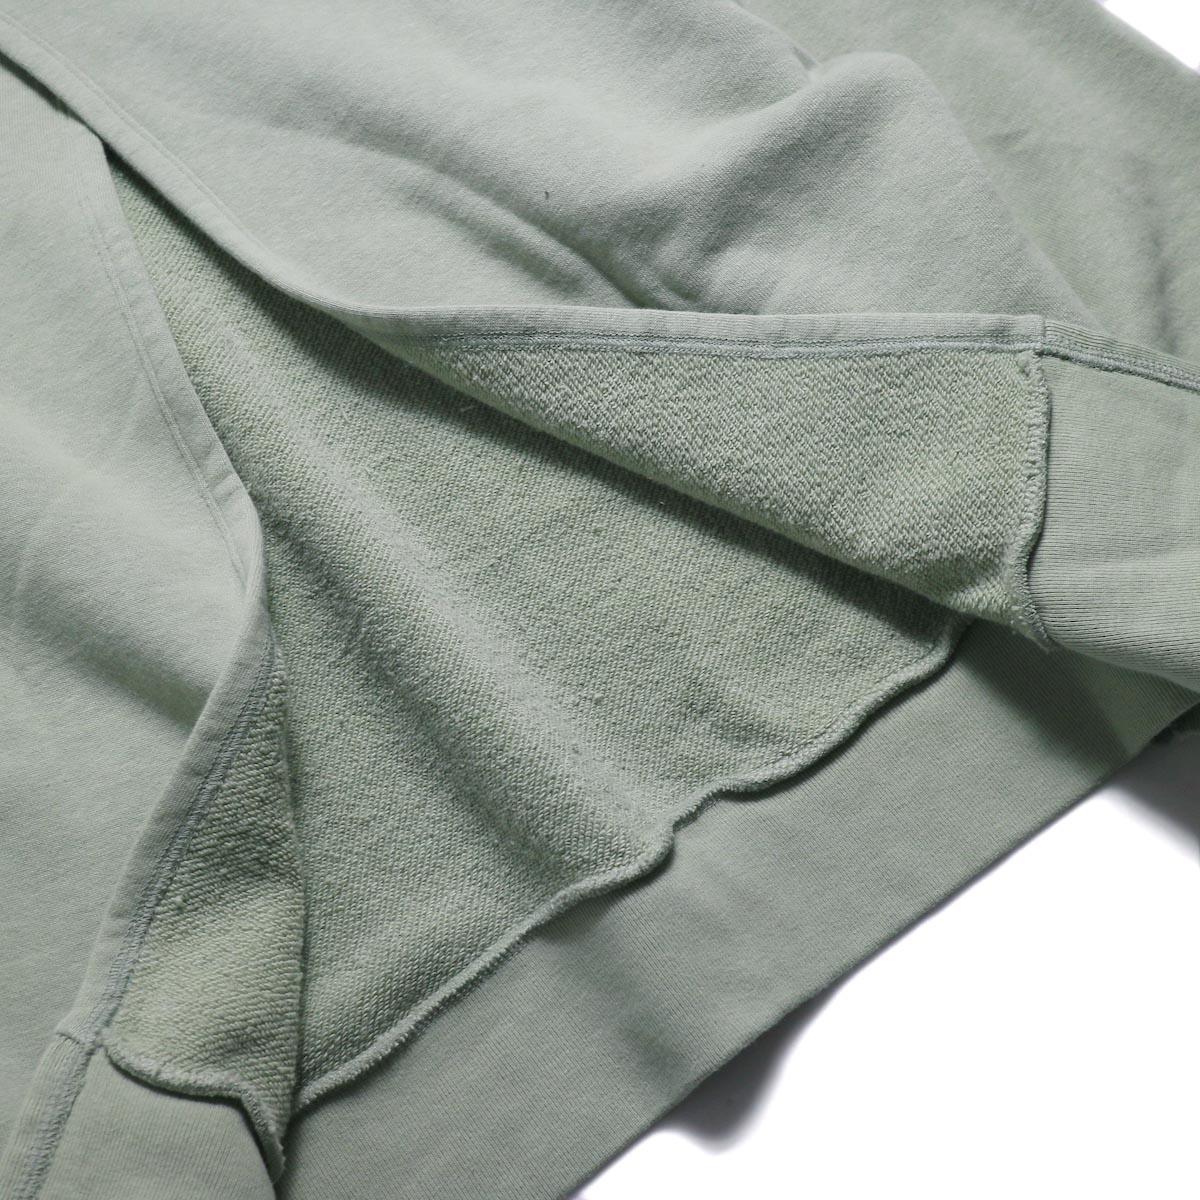 UNUSED / US1530 Crew Neck Sweat Shirt -SAGE GREEN 背面スリット